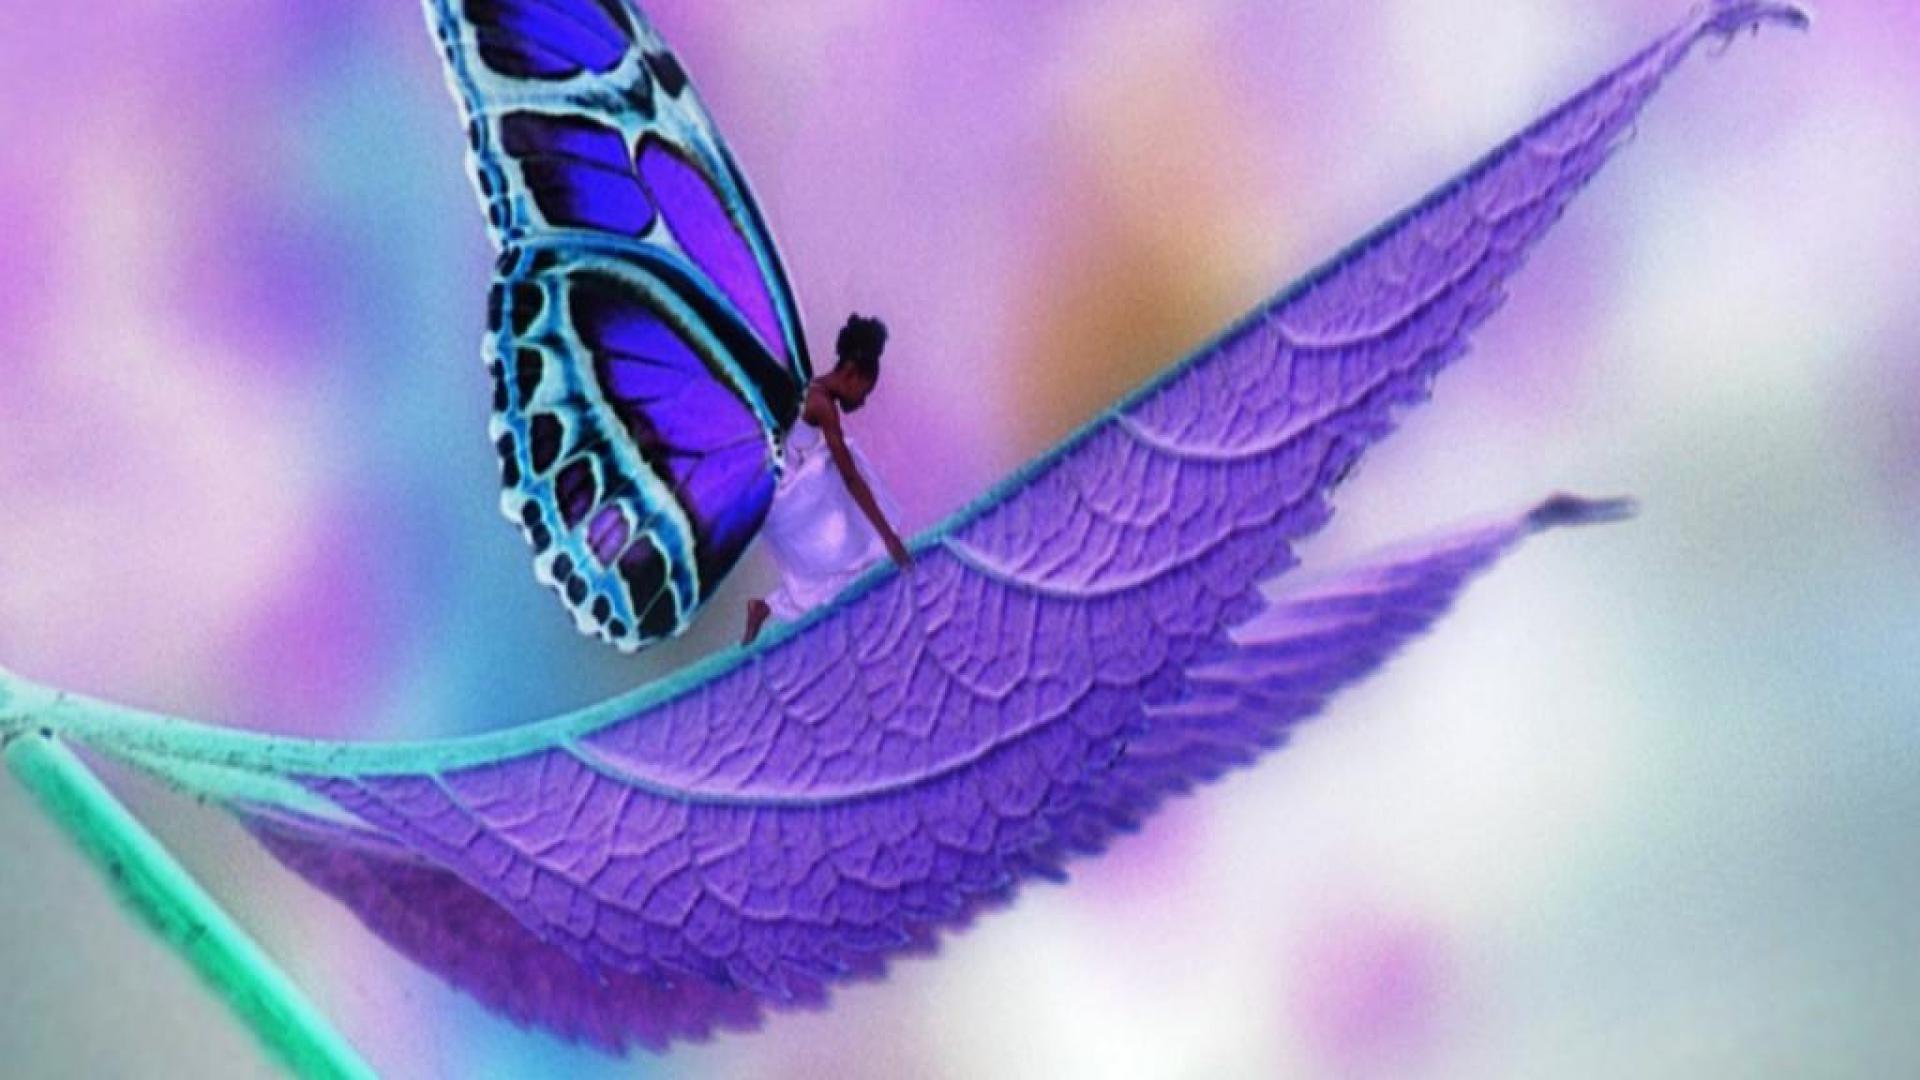 75+ Cute Butterfly Wallpapers on WallpaperSafari